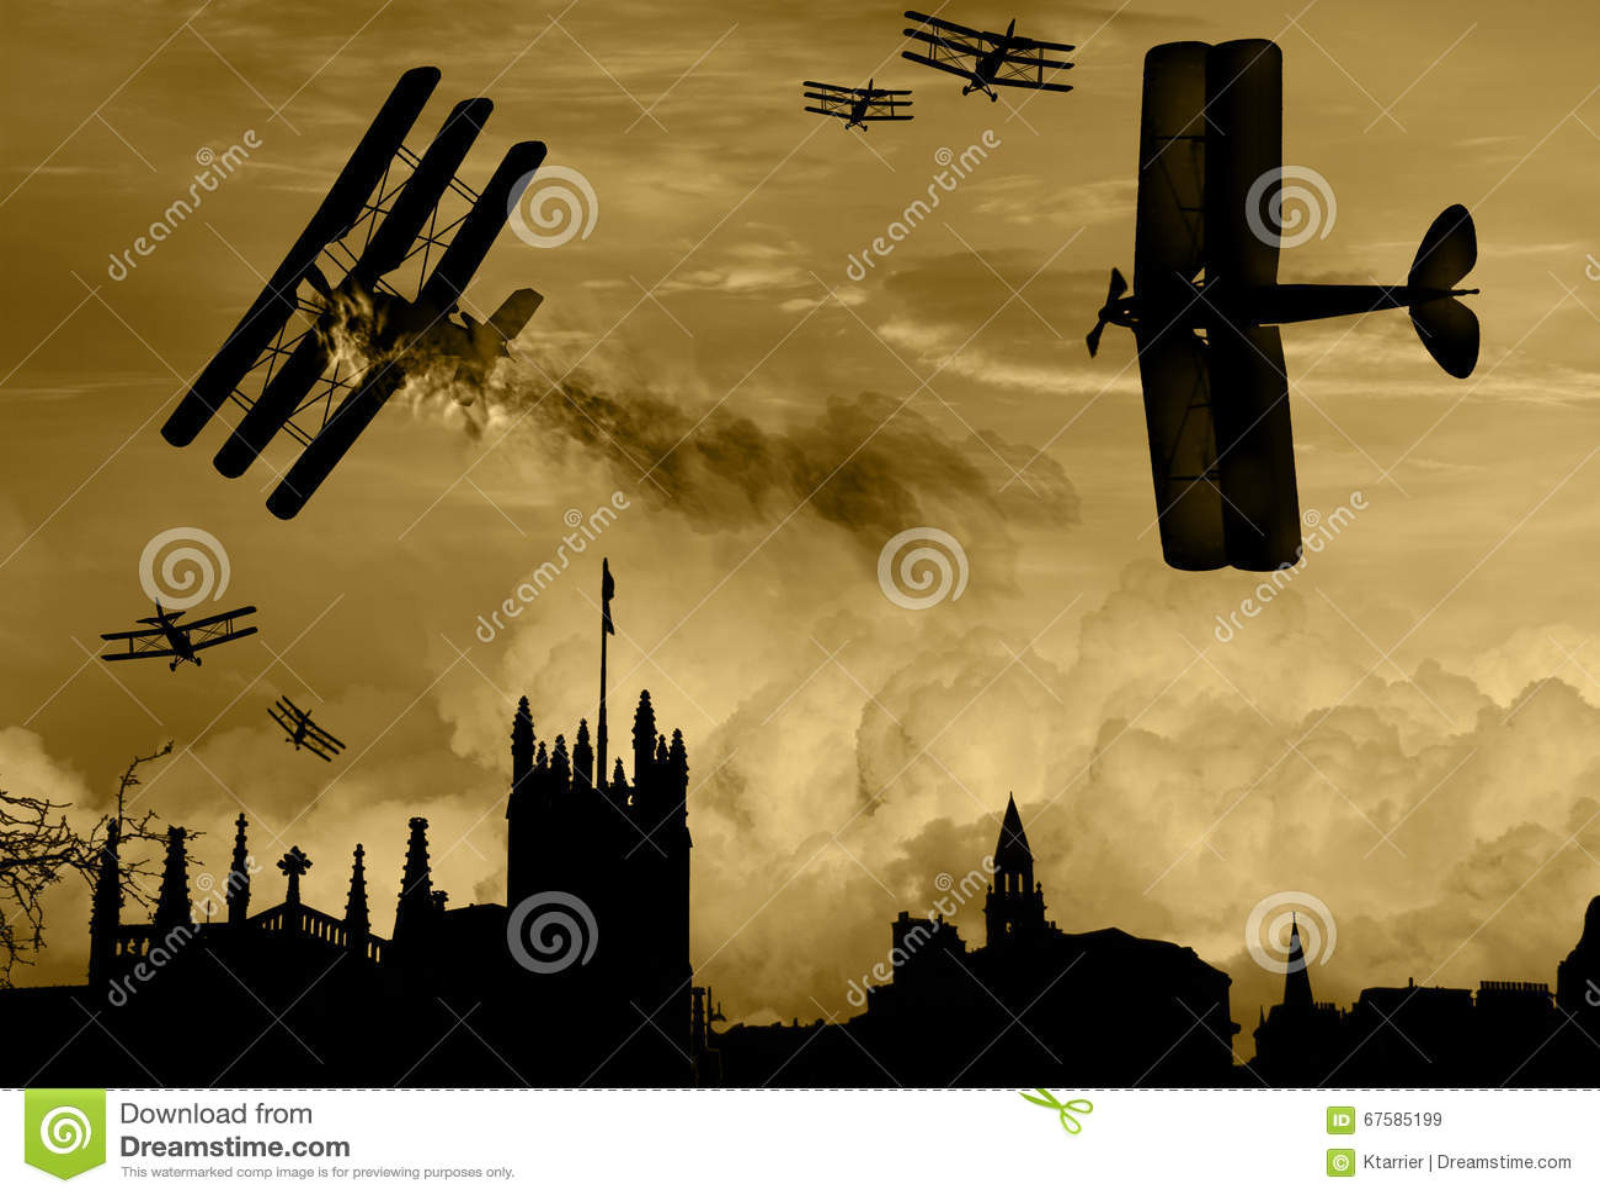 World War 1 Aircraft Scene Stock Illustration - Image ... | 1300 x 989 jpeg 127kB